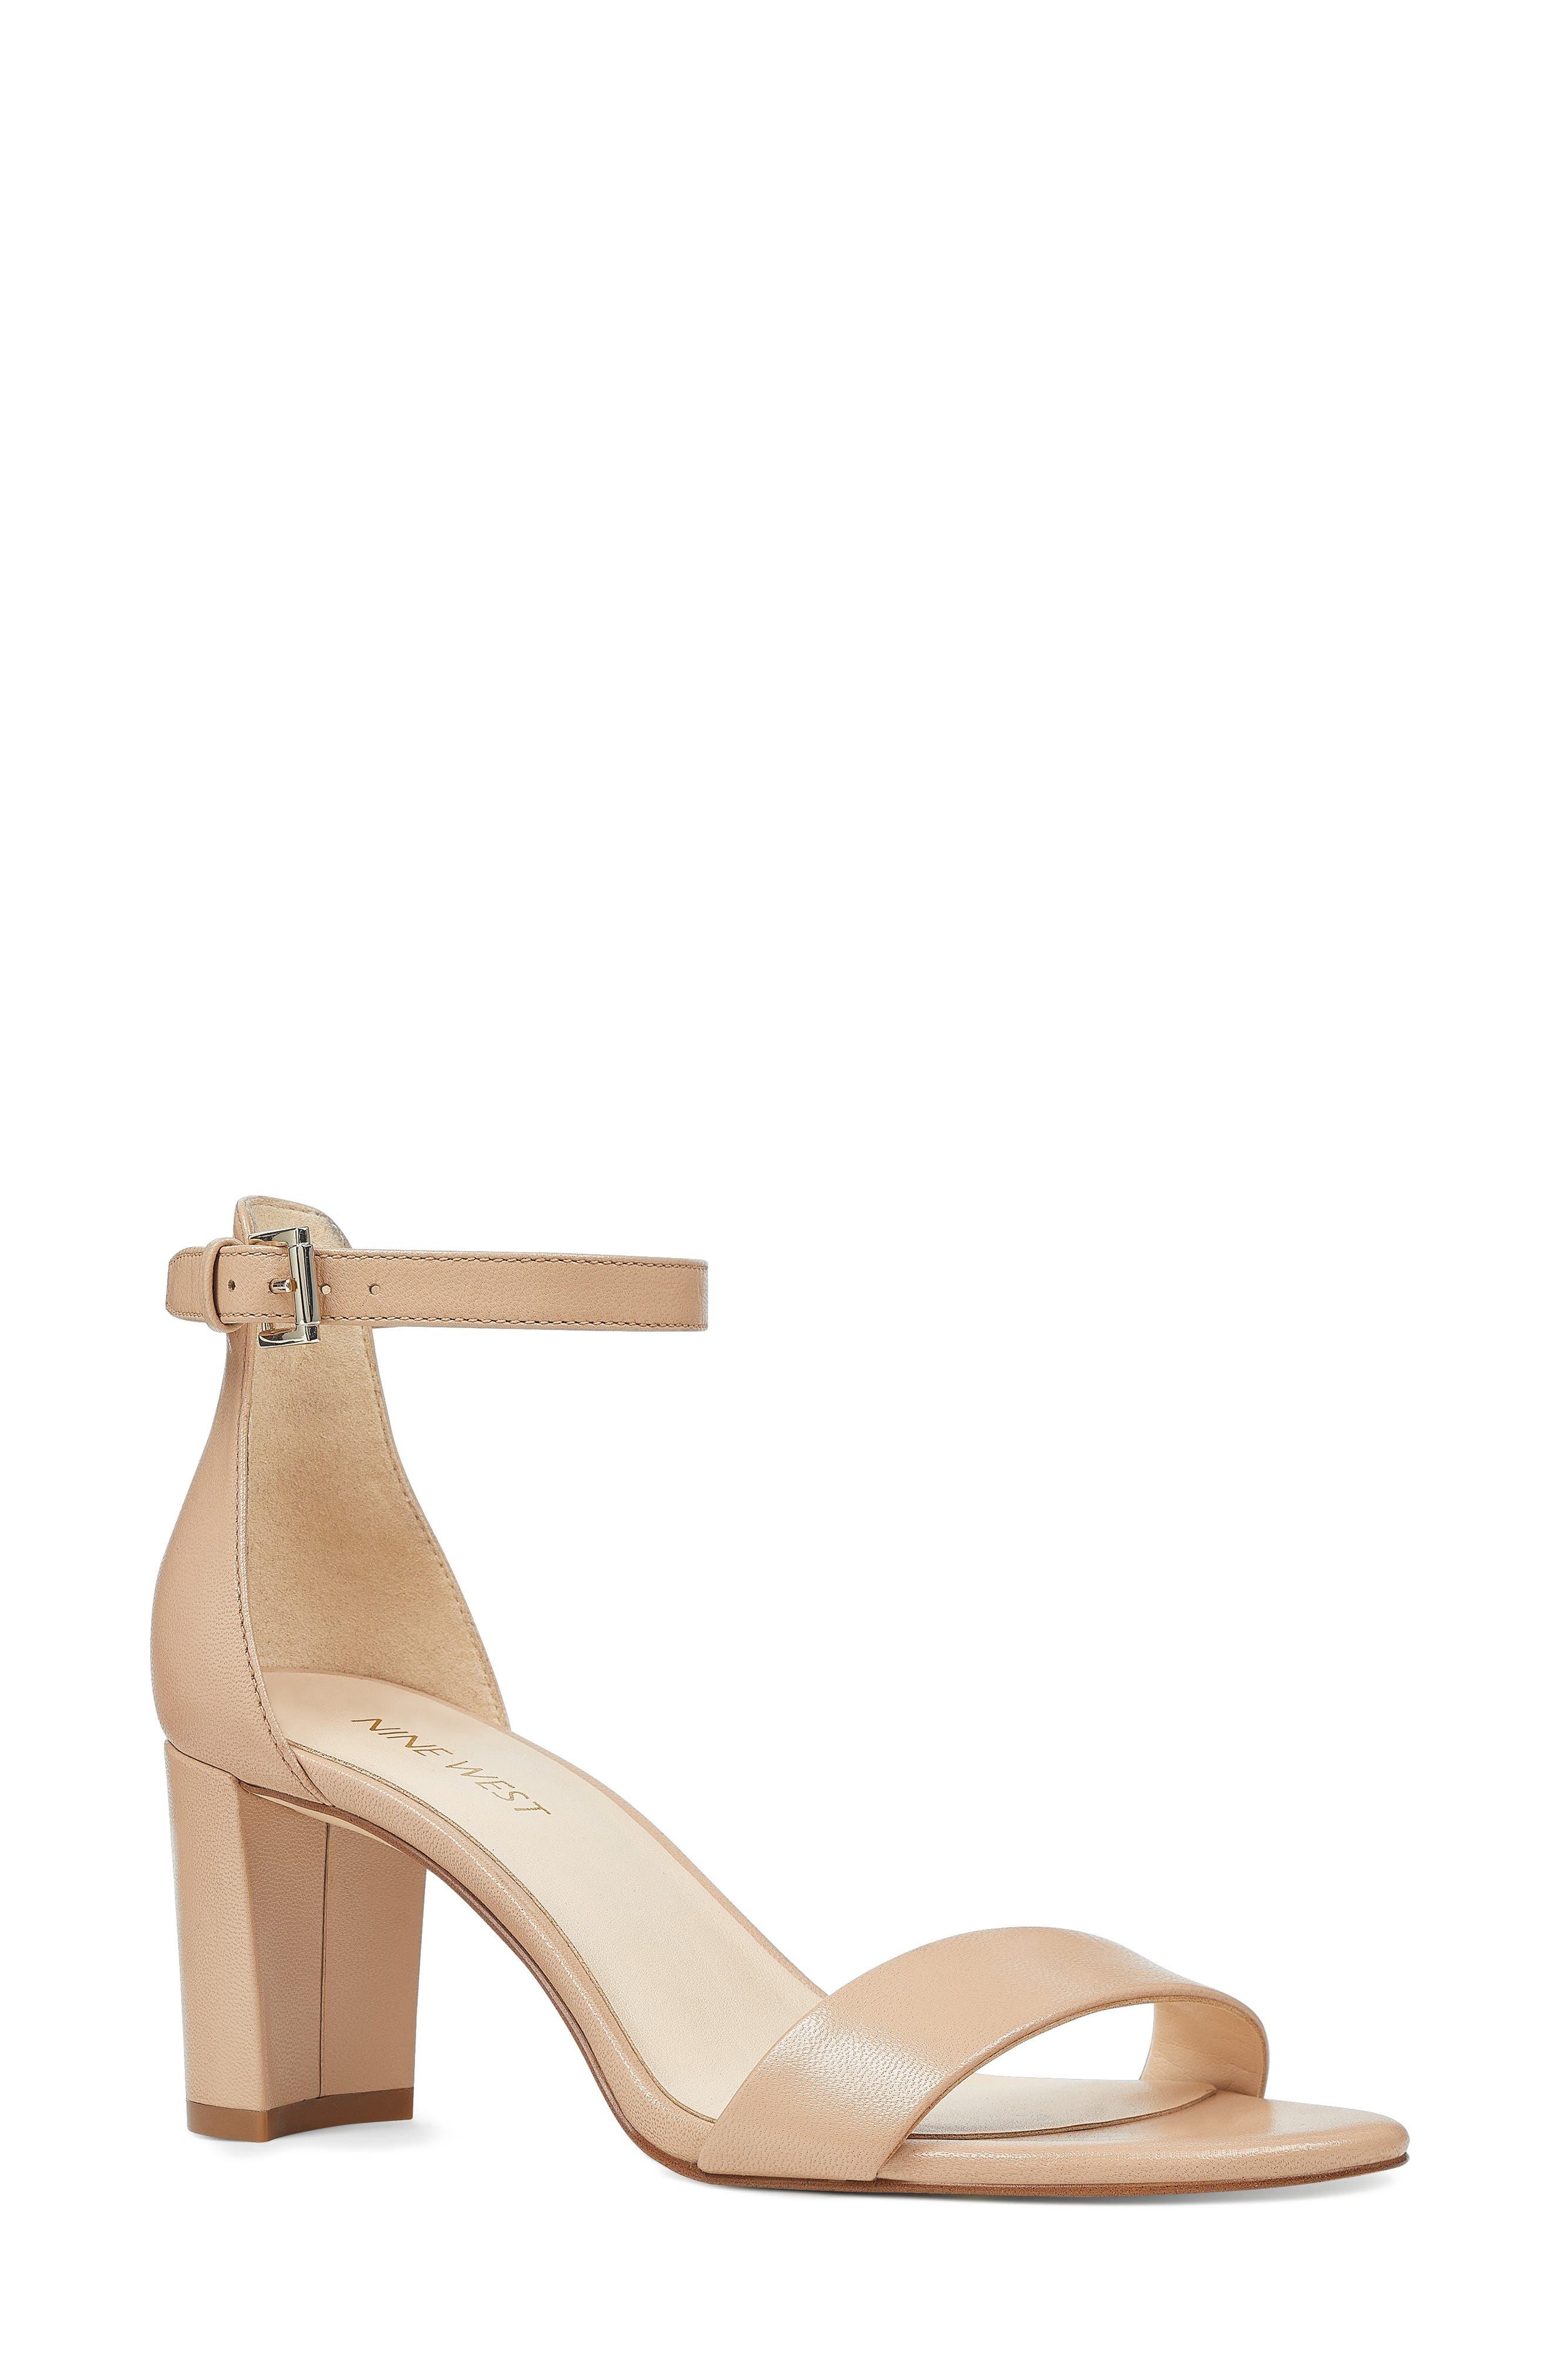 Pruce Ankle Strap Sandal,                         Main,                         color, LIGHT NATURAL LEATHER